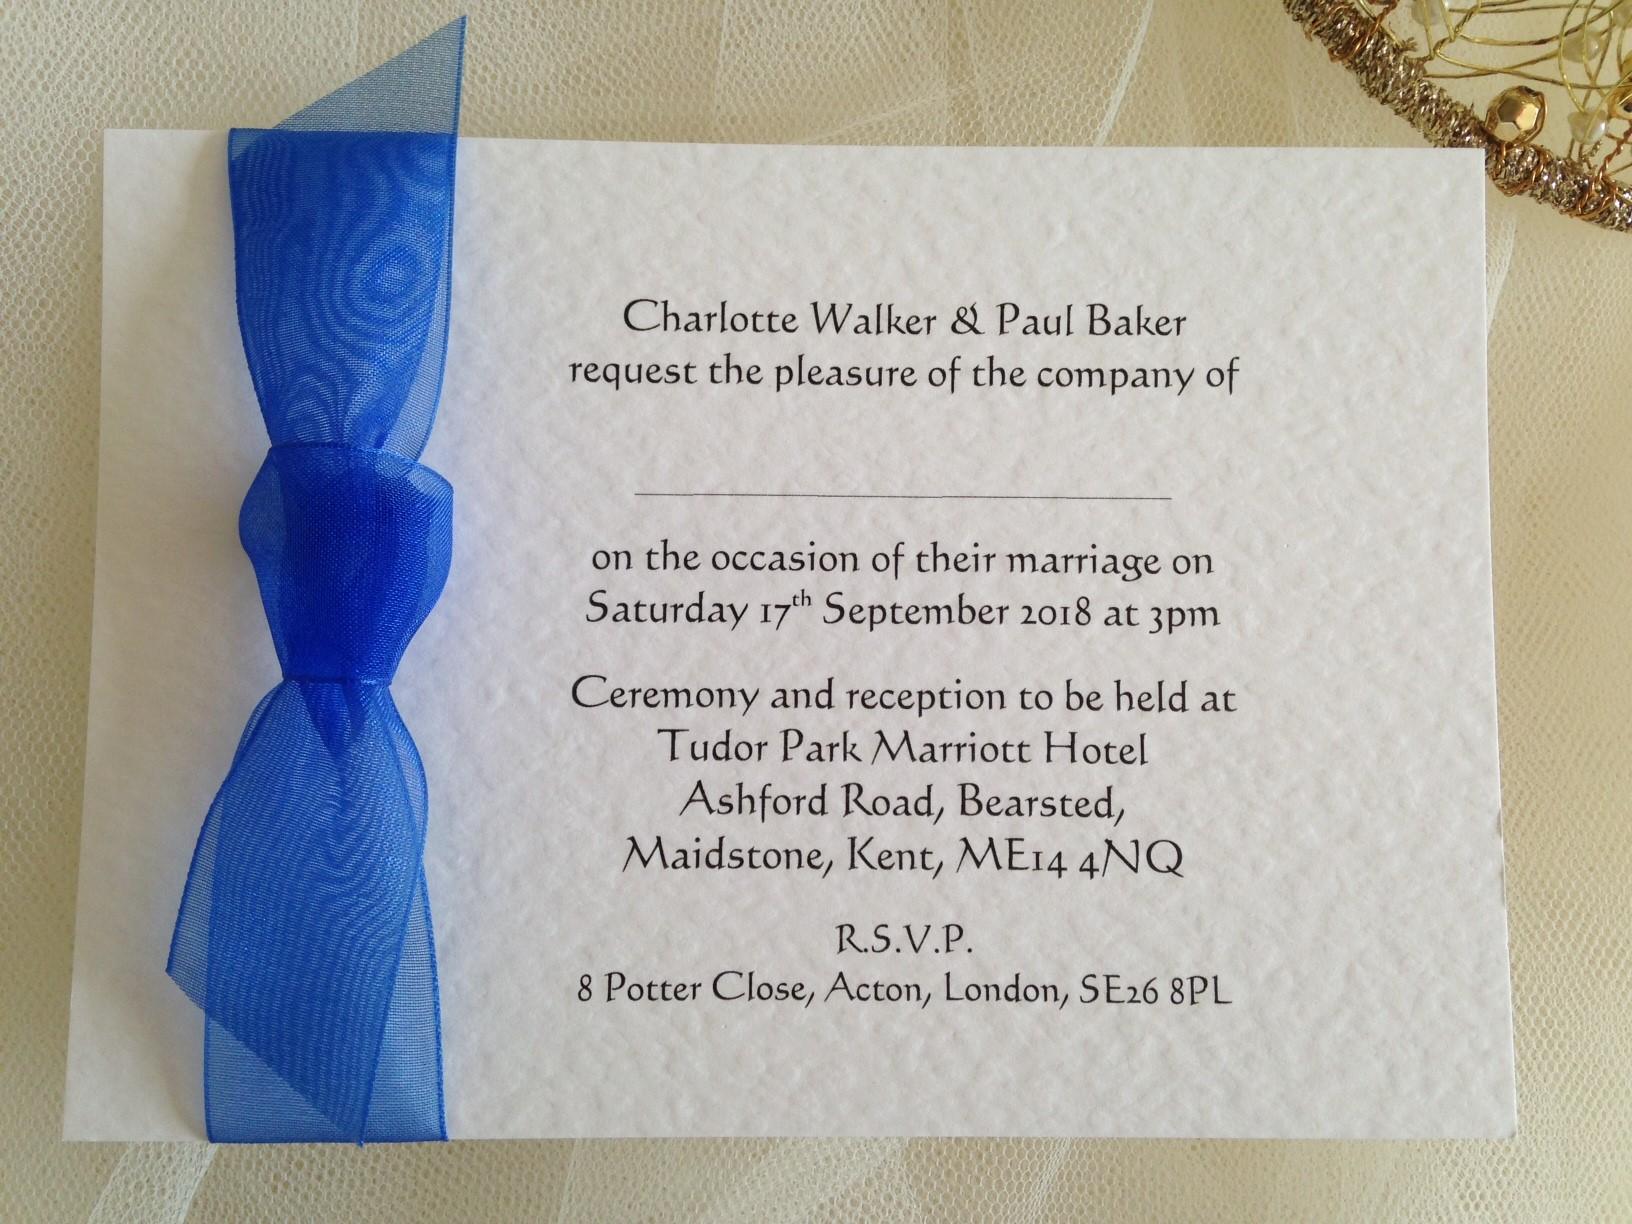 Royal Blue Wedding Invitations Cheap - Ivoiregion